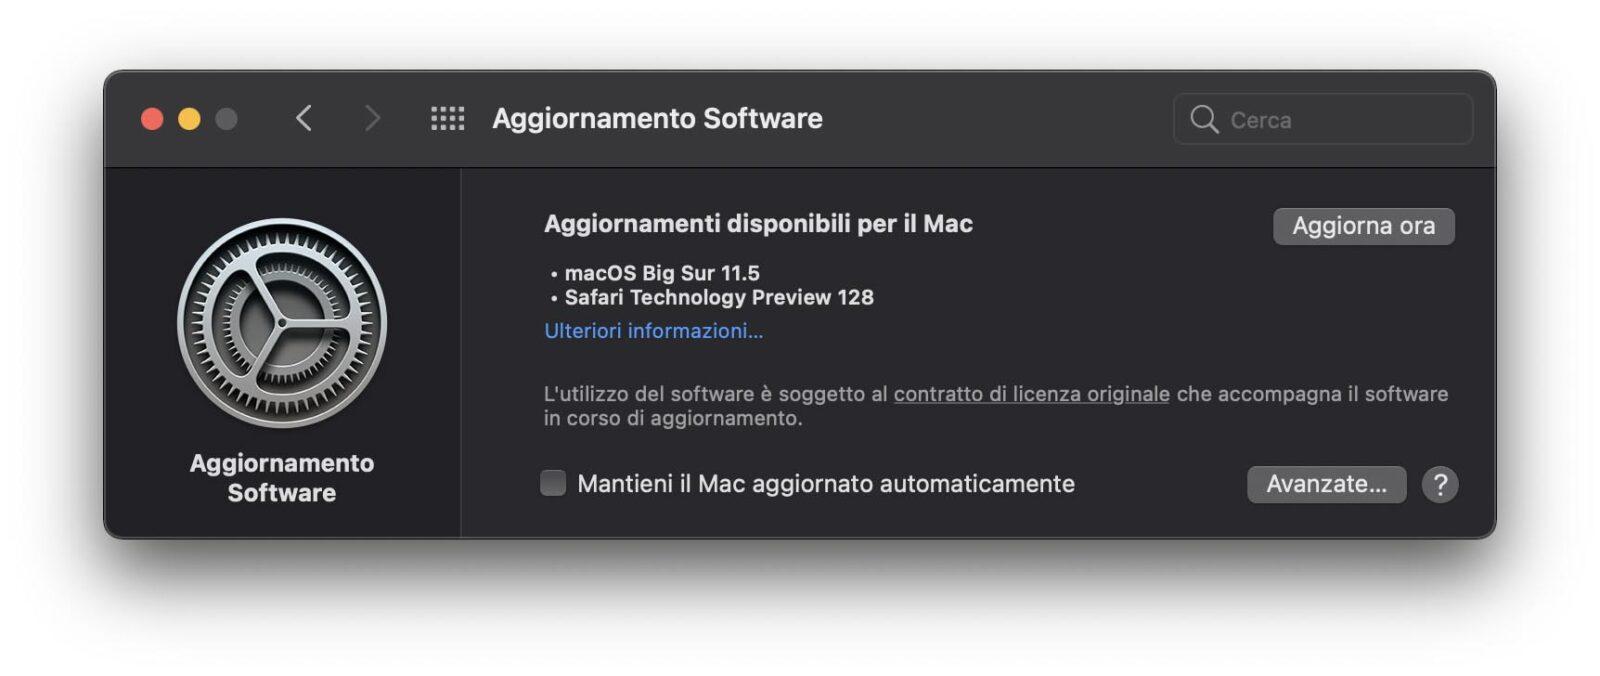 Disponibile aggiornamento a macOS Big Sur 11.5